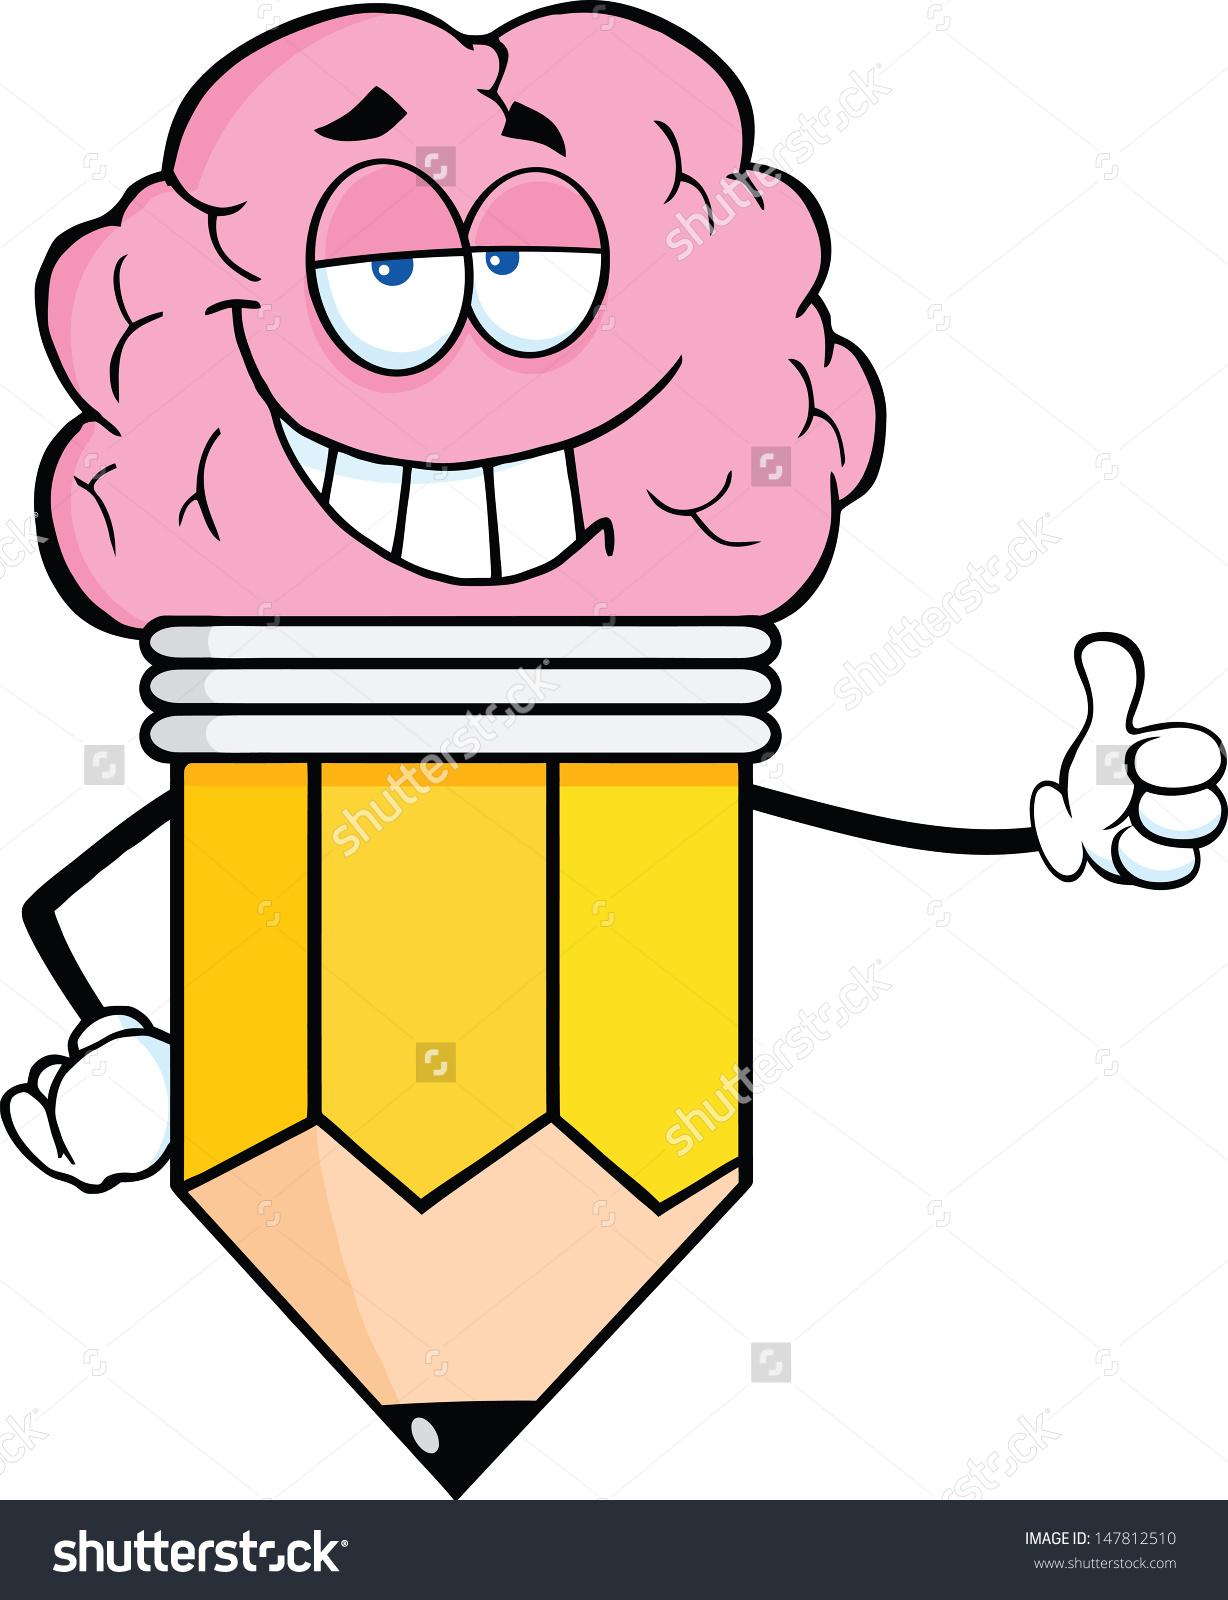 Clever Pencil Cartoon Character Big Brain Stock Vector 147812510.